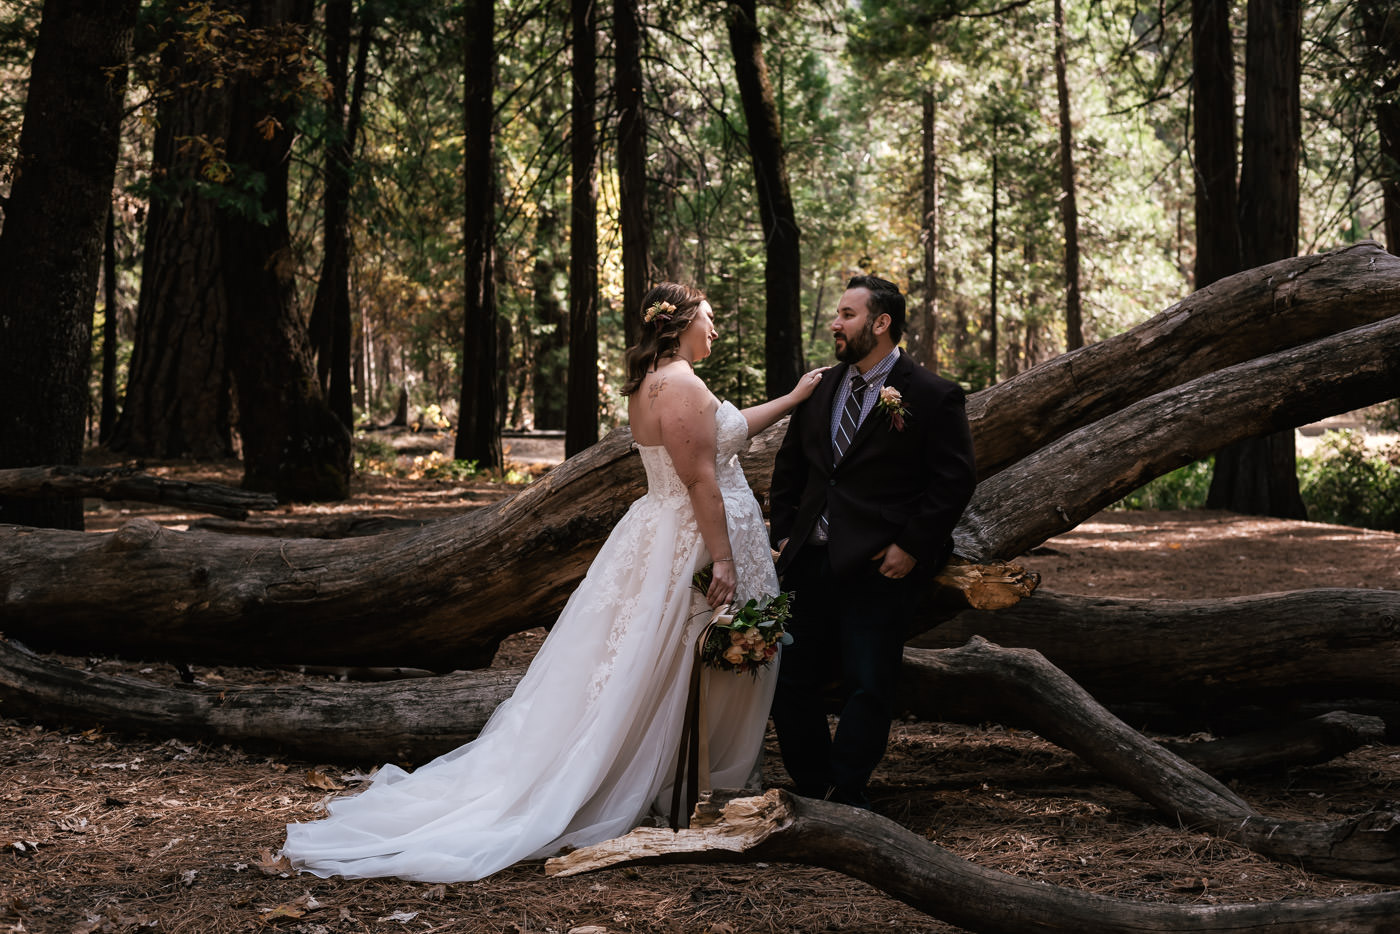 yosemite-swinging-bridge-first-look-wedding-16.jpg